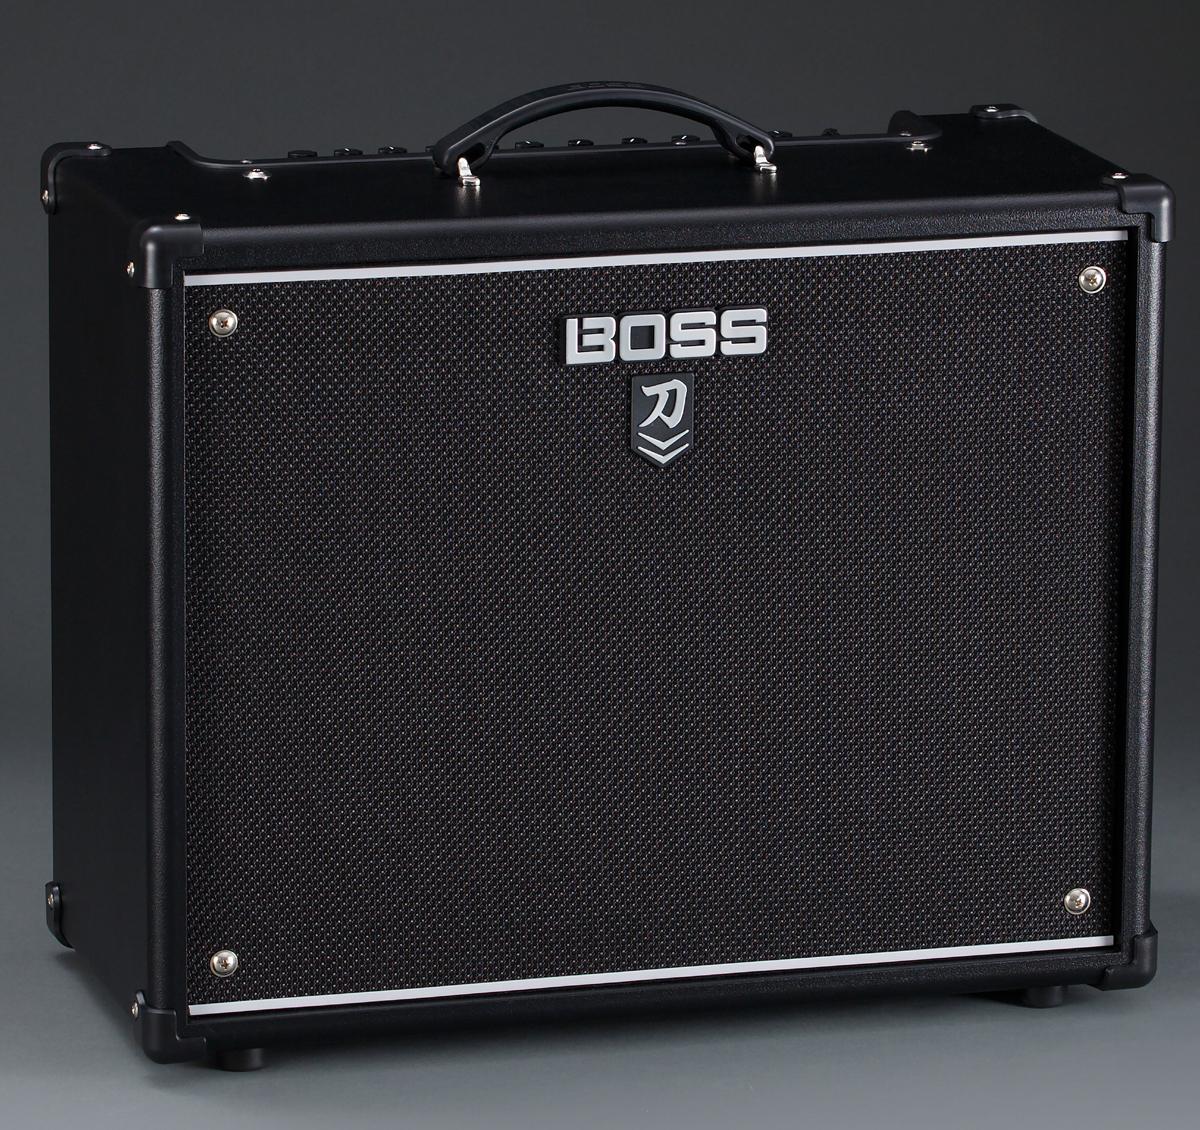 BOSS KATANA-100 MkII 新品 ギター用コンボアンプ[ボス][刀シリーズ][マーク2][Guitar Combo Amplifier]